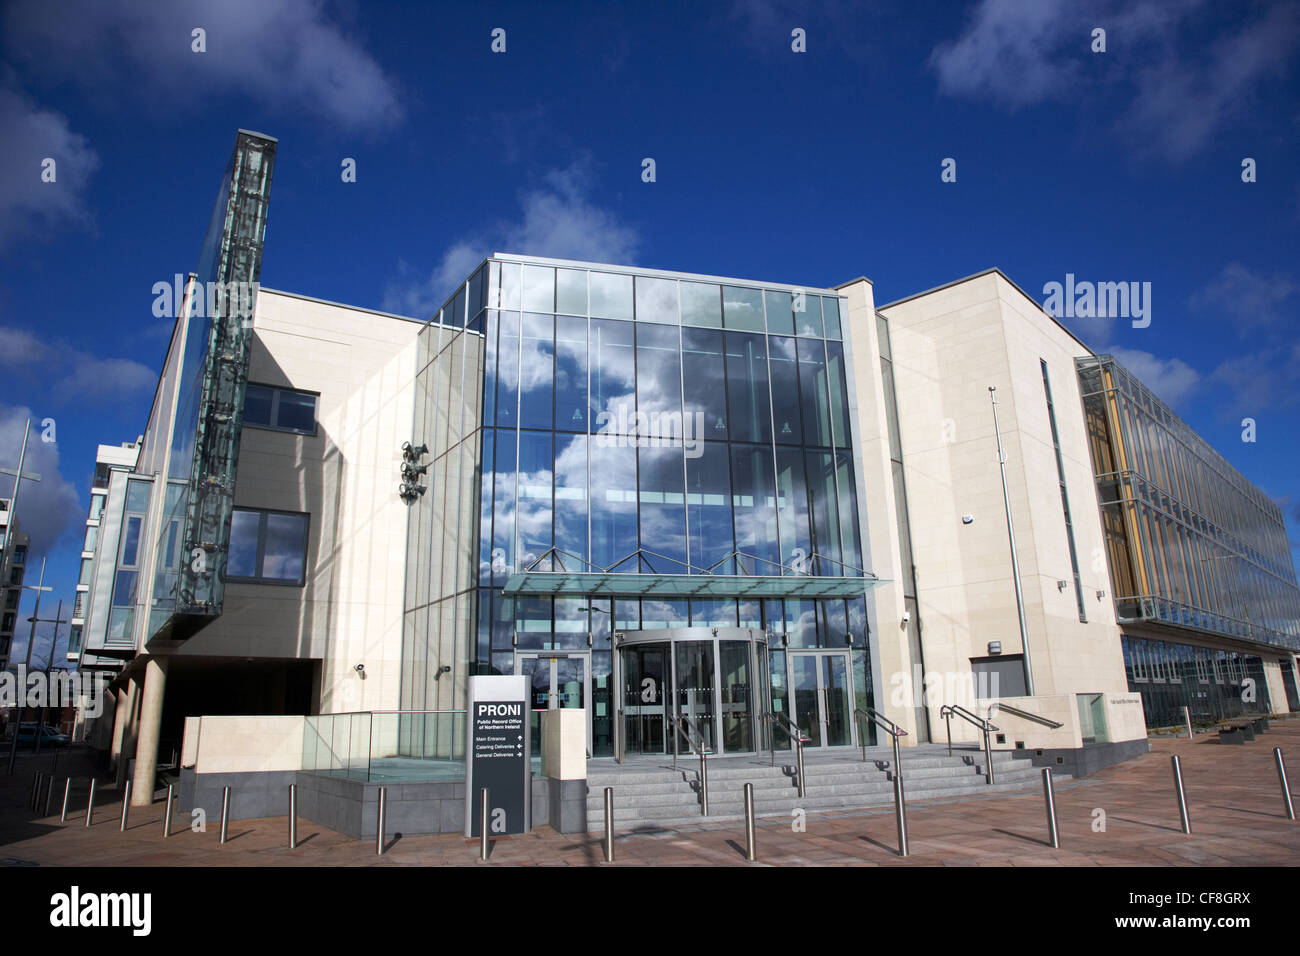 proni public record office of northern ireland titanic quarter Belfast Northern Ireland UK - Stock Image